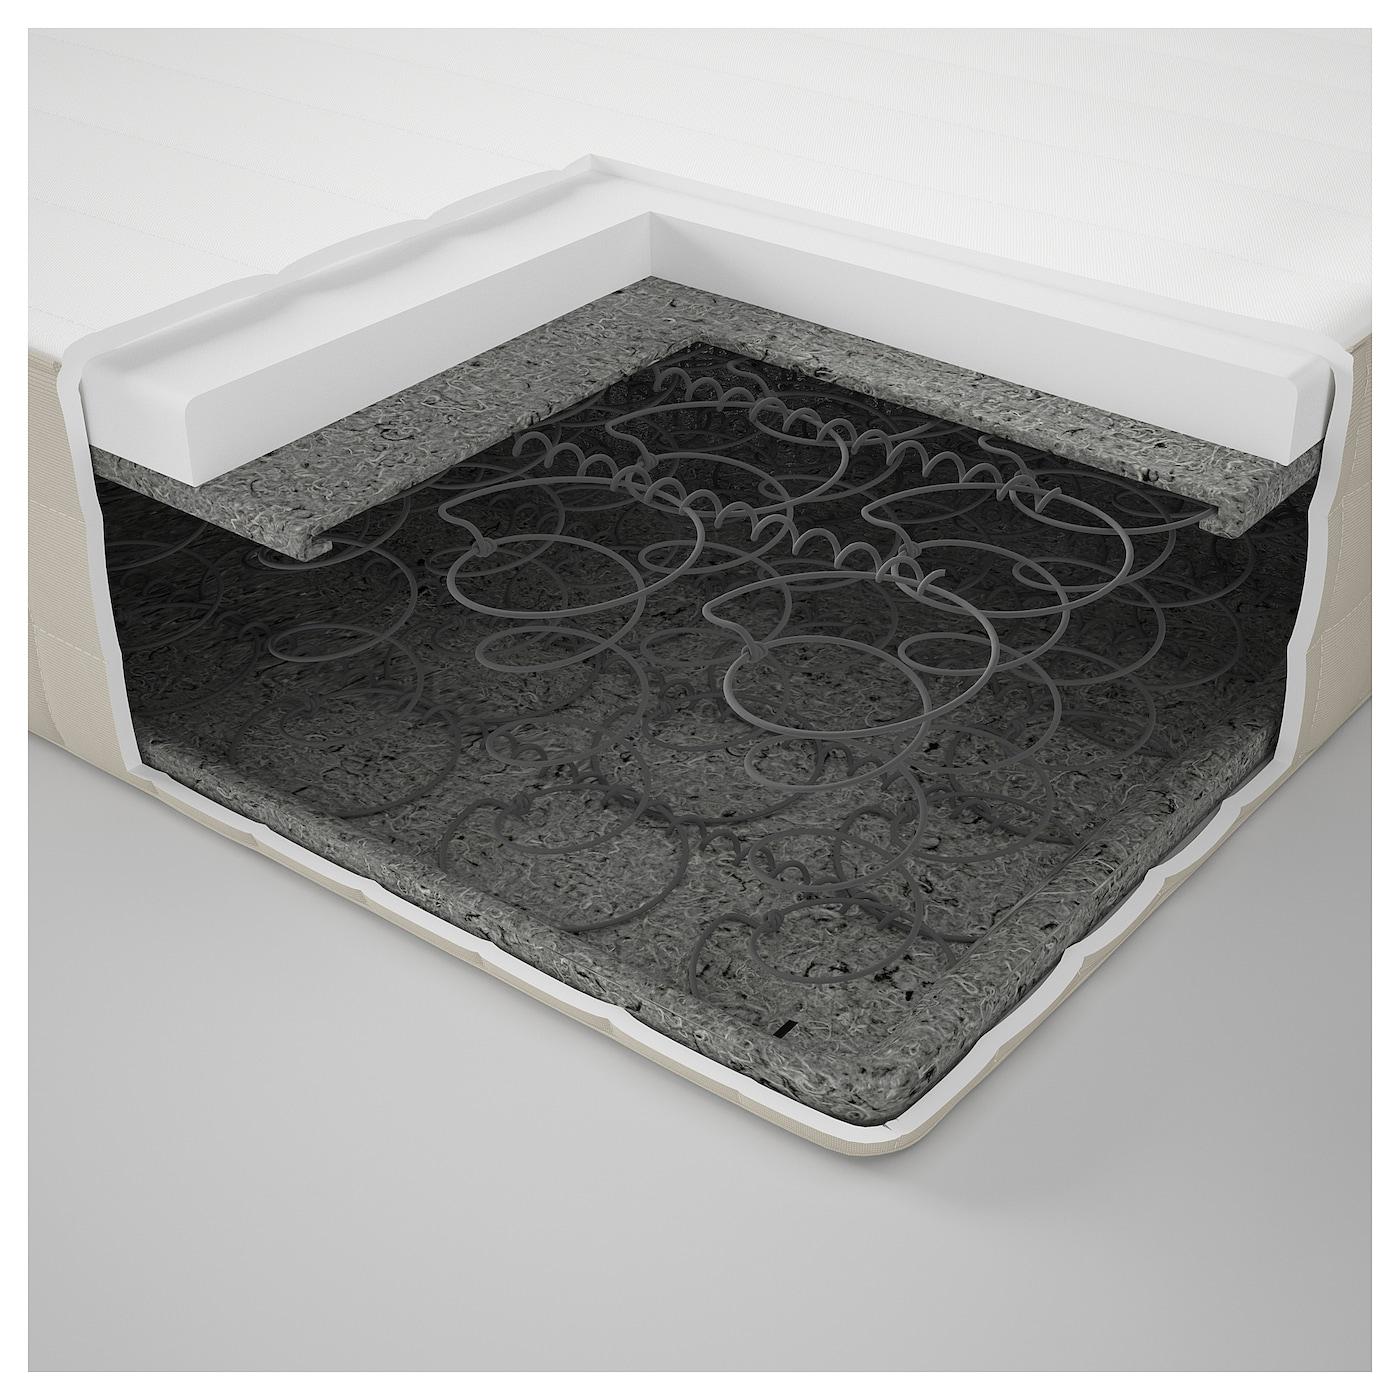 hafslo matelas ressorts mi ferme beige 140x200 cm ikea. Black Bedroom Furniture Sets. Home Design Ideas